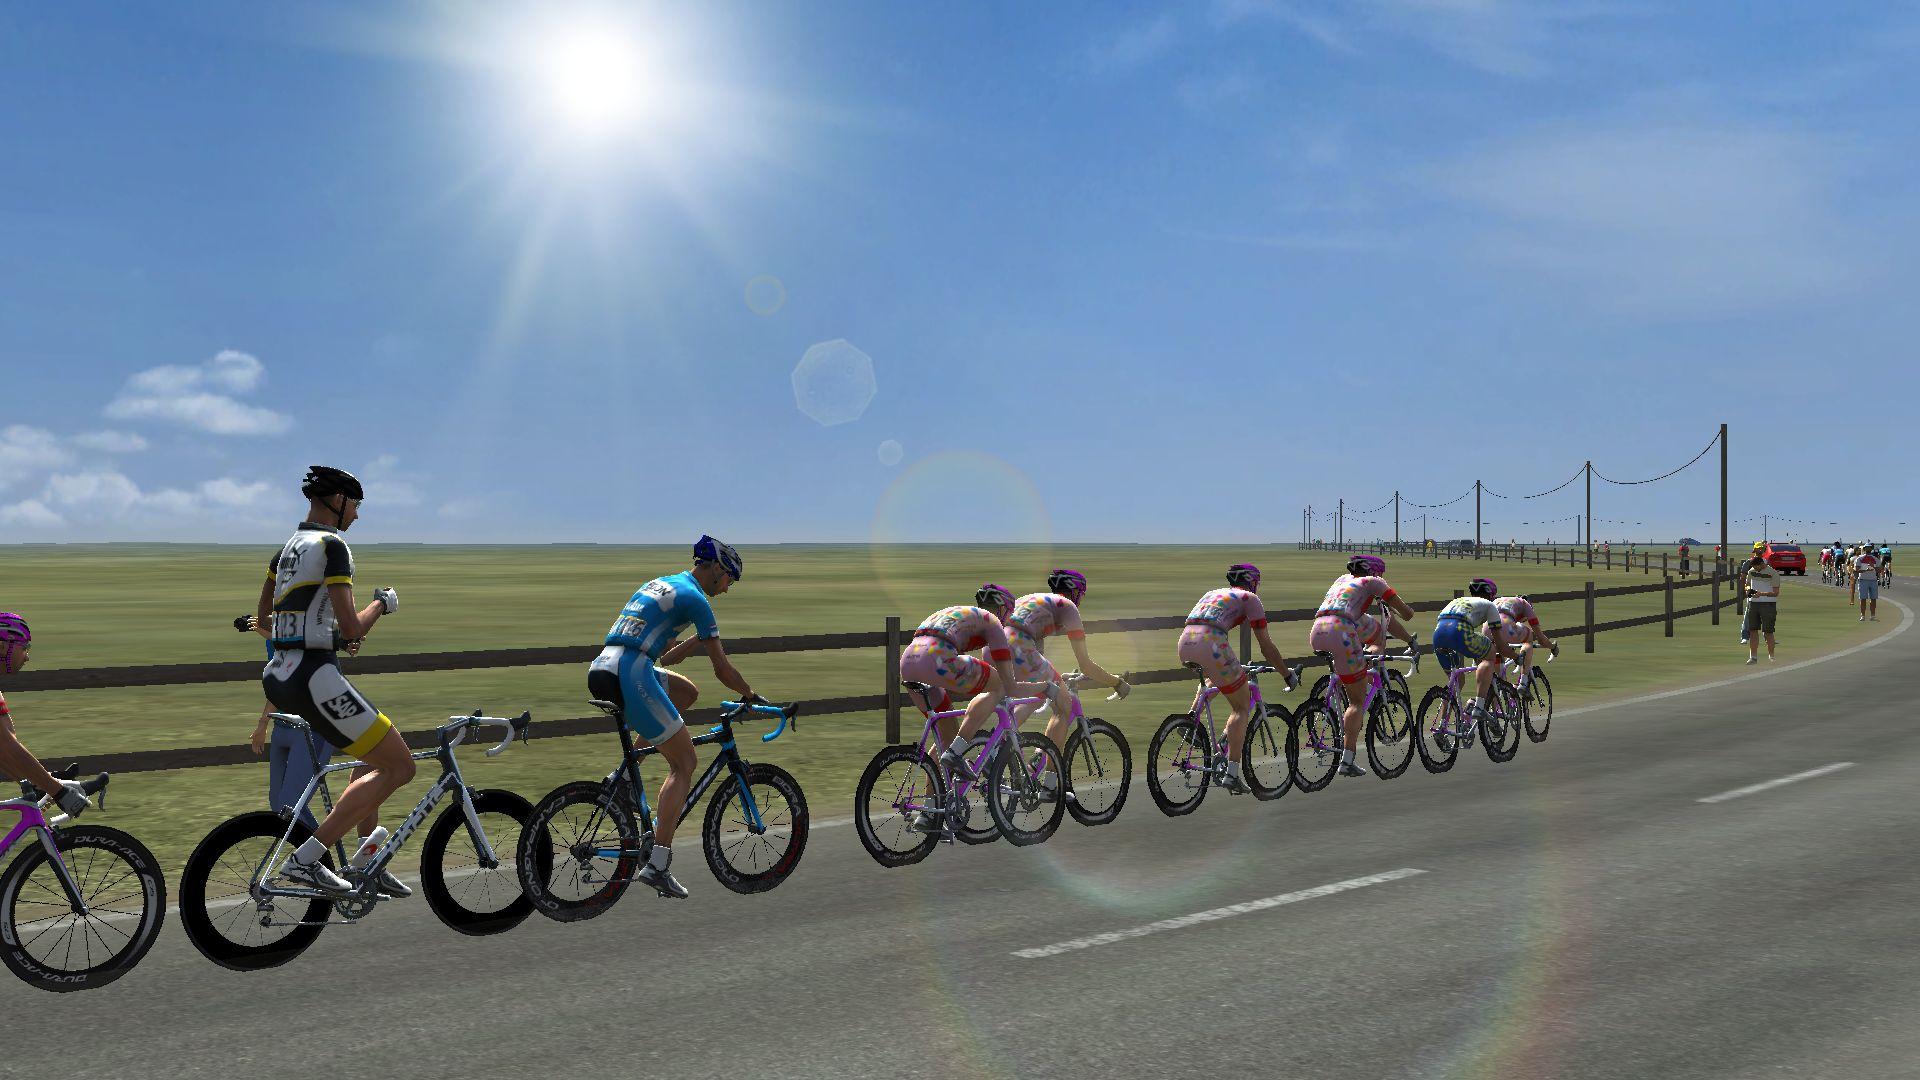 pcmdaily.com/images/mg/2019/Races/GTM/Giro/mg19_giro_10_PCM0074.jpg